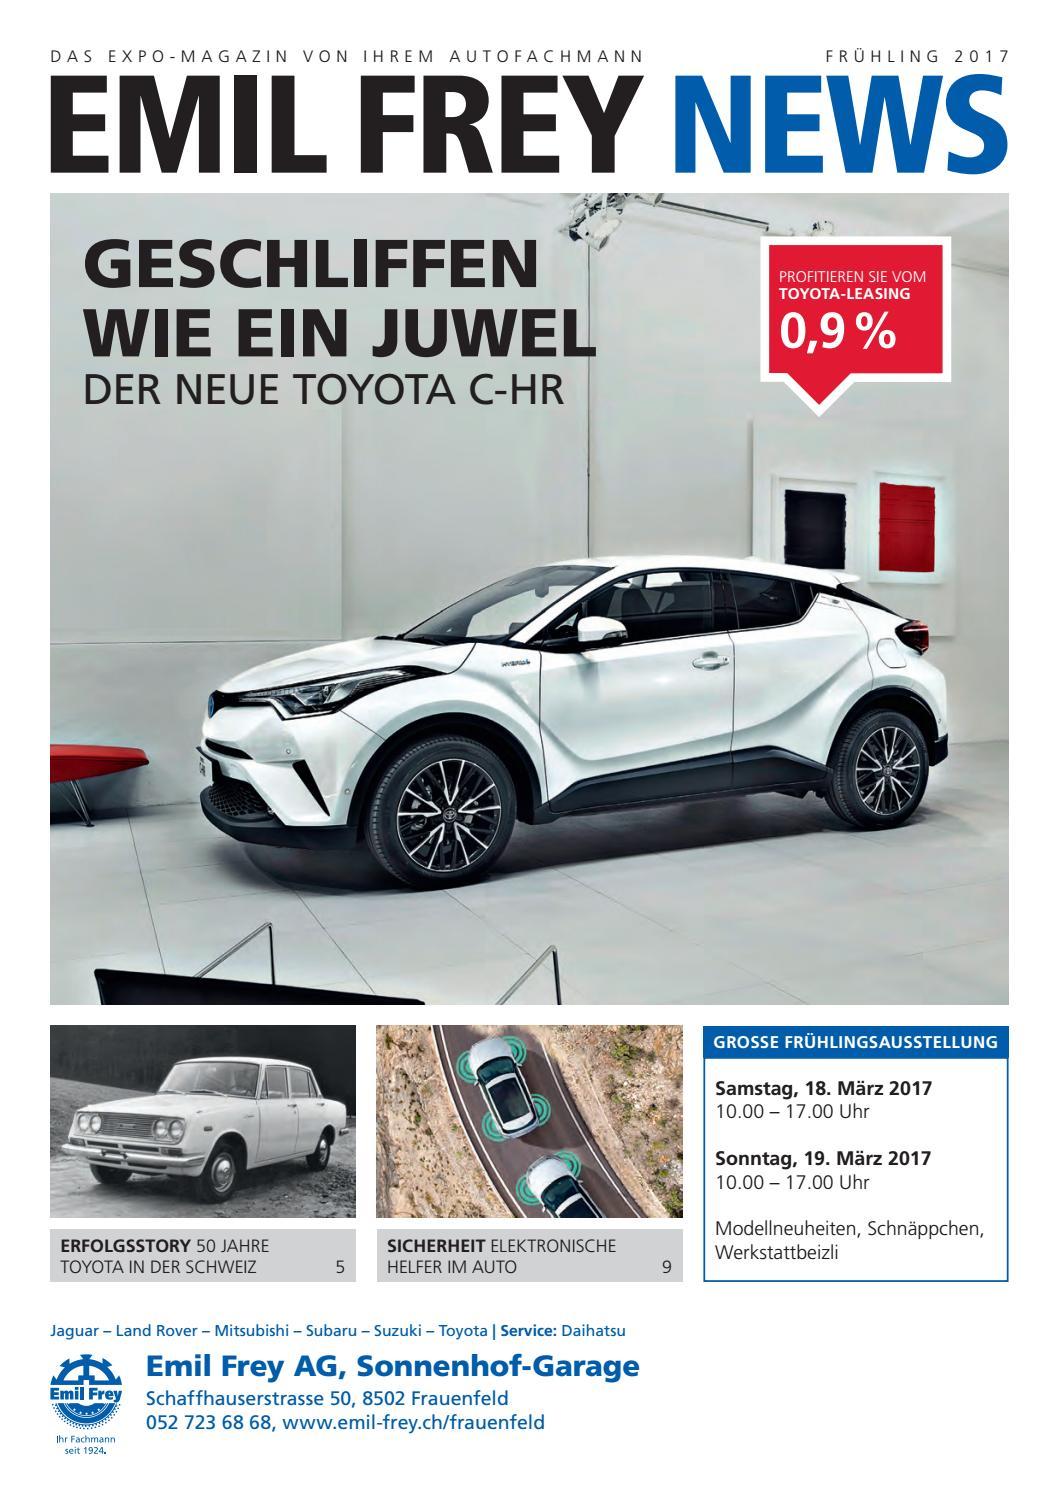 Emil Frey News Frauenfeld - Frühling 2017 by Autoglobal AG - issuu